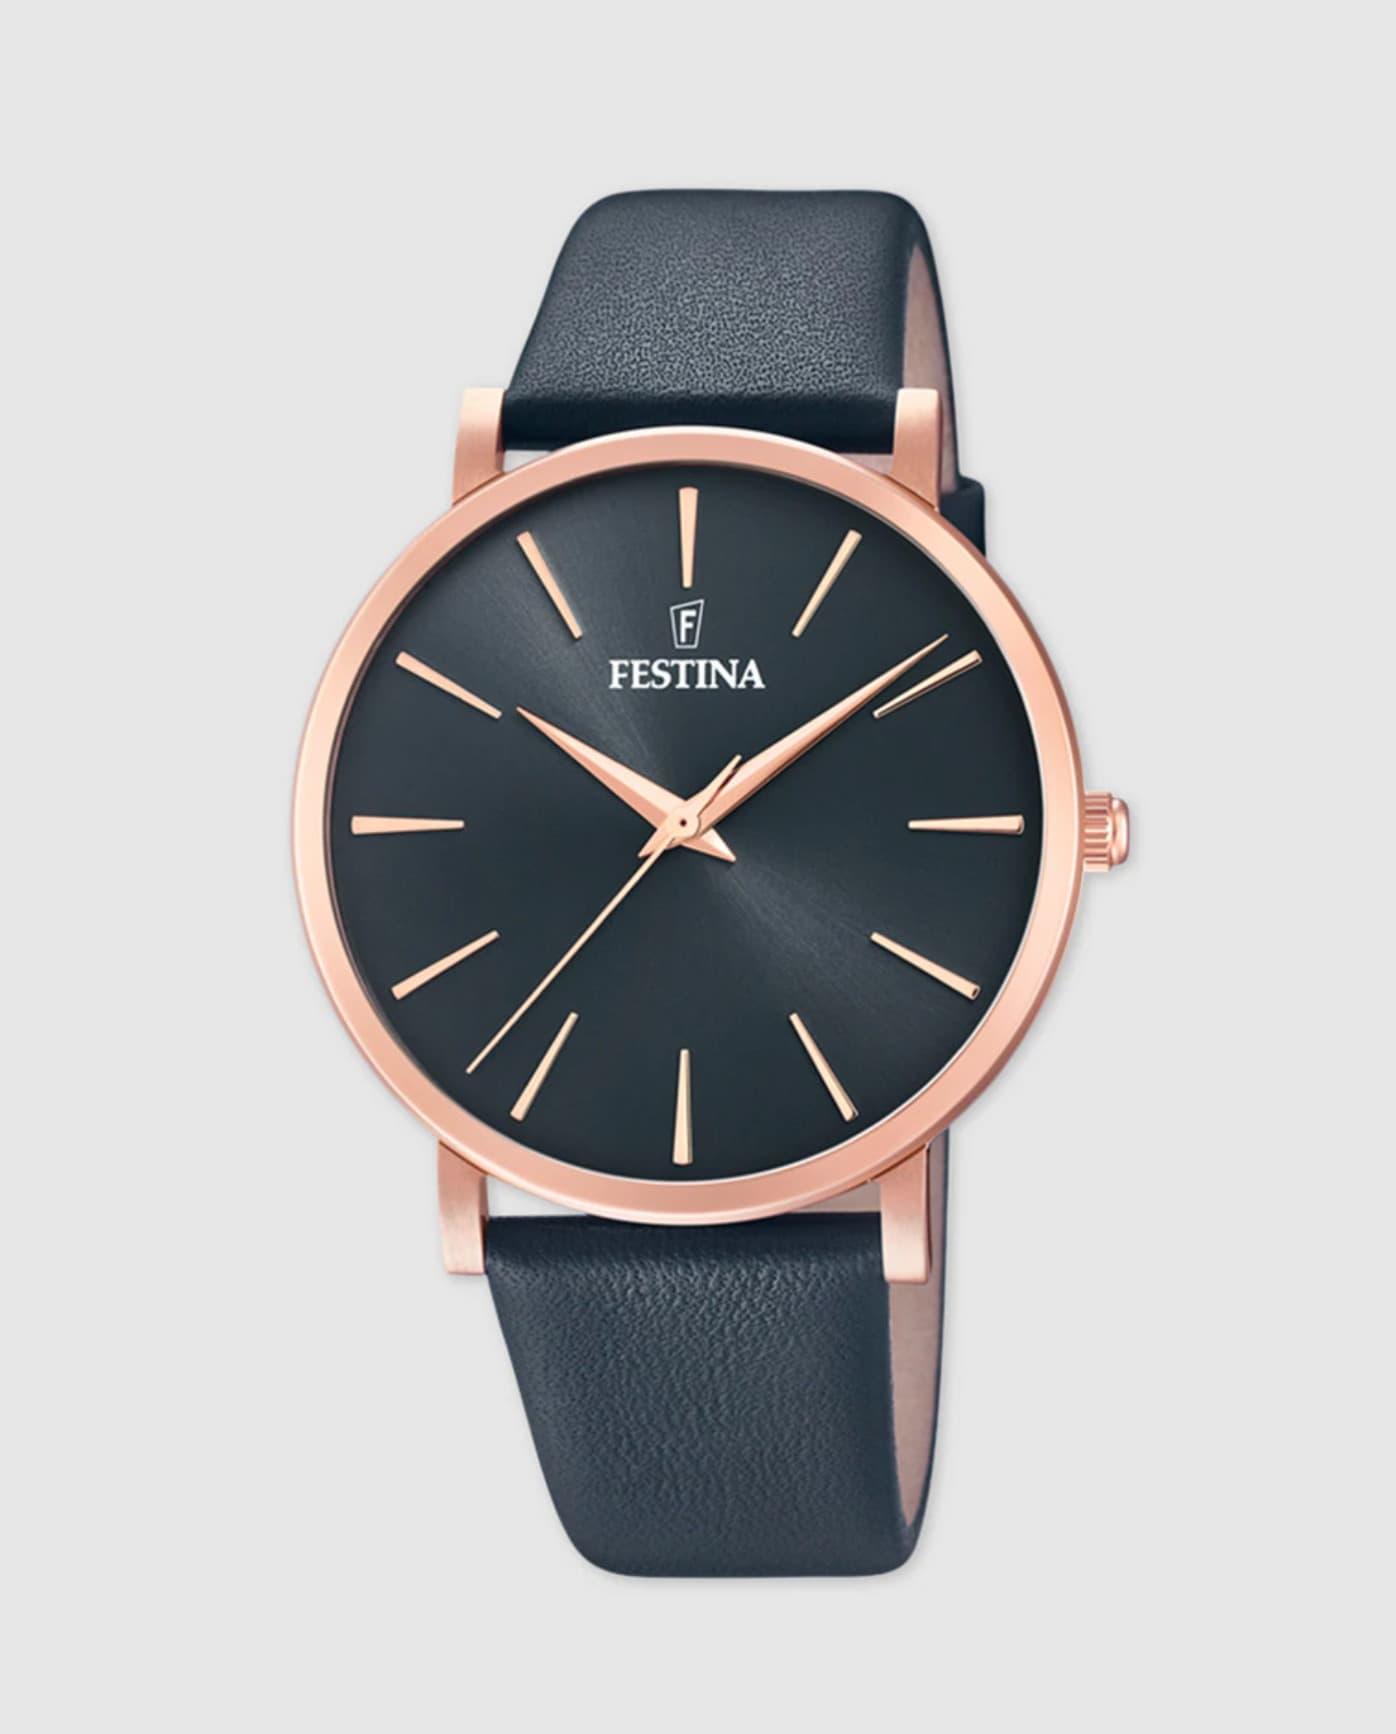 Reloj de mujer Festina Boyfriend F20373/2 de piel gris